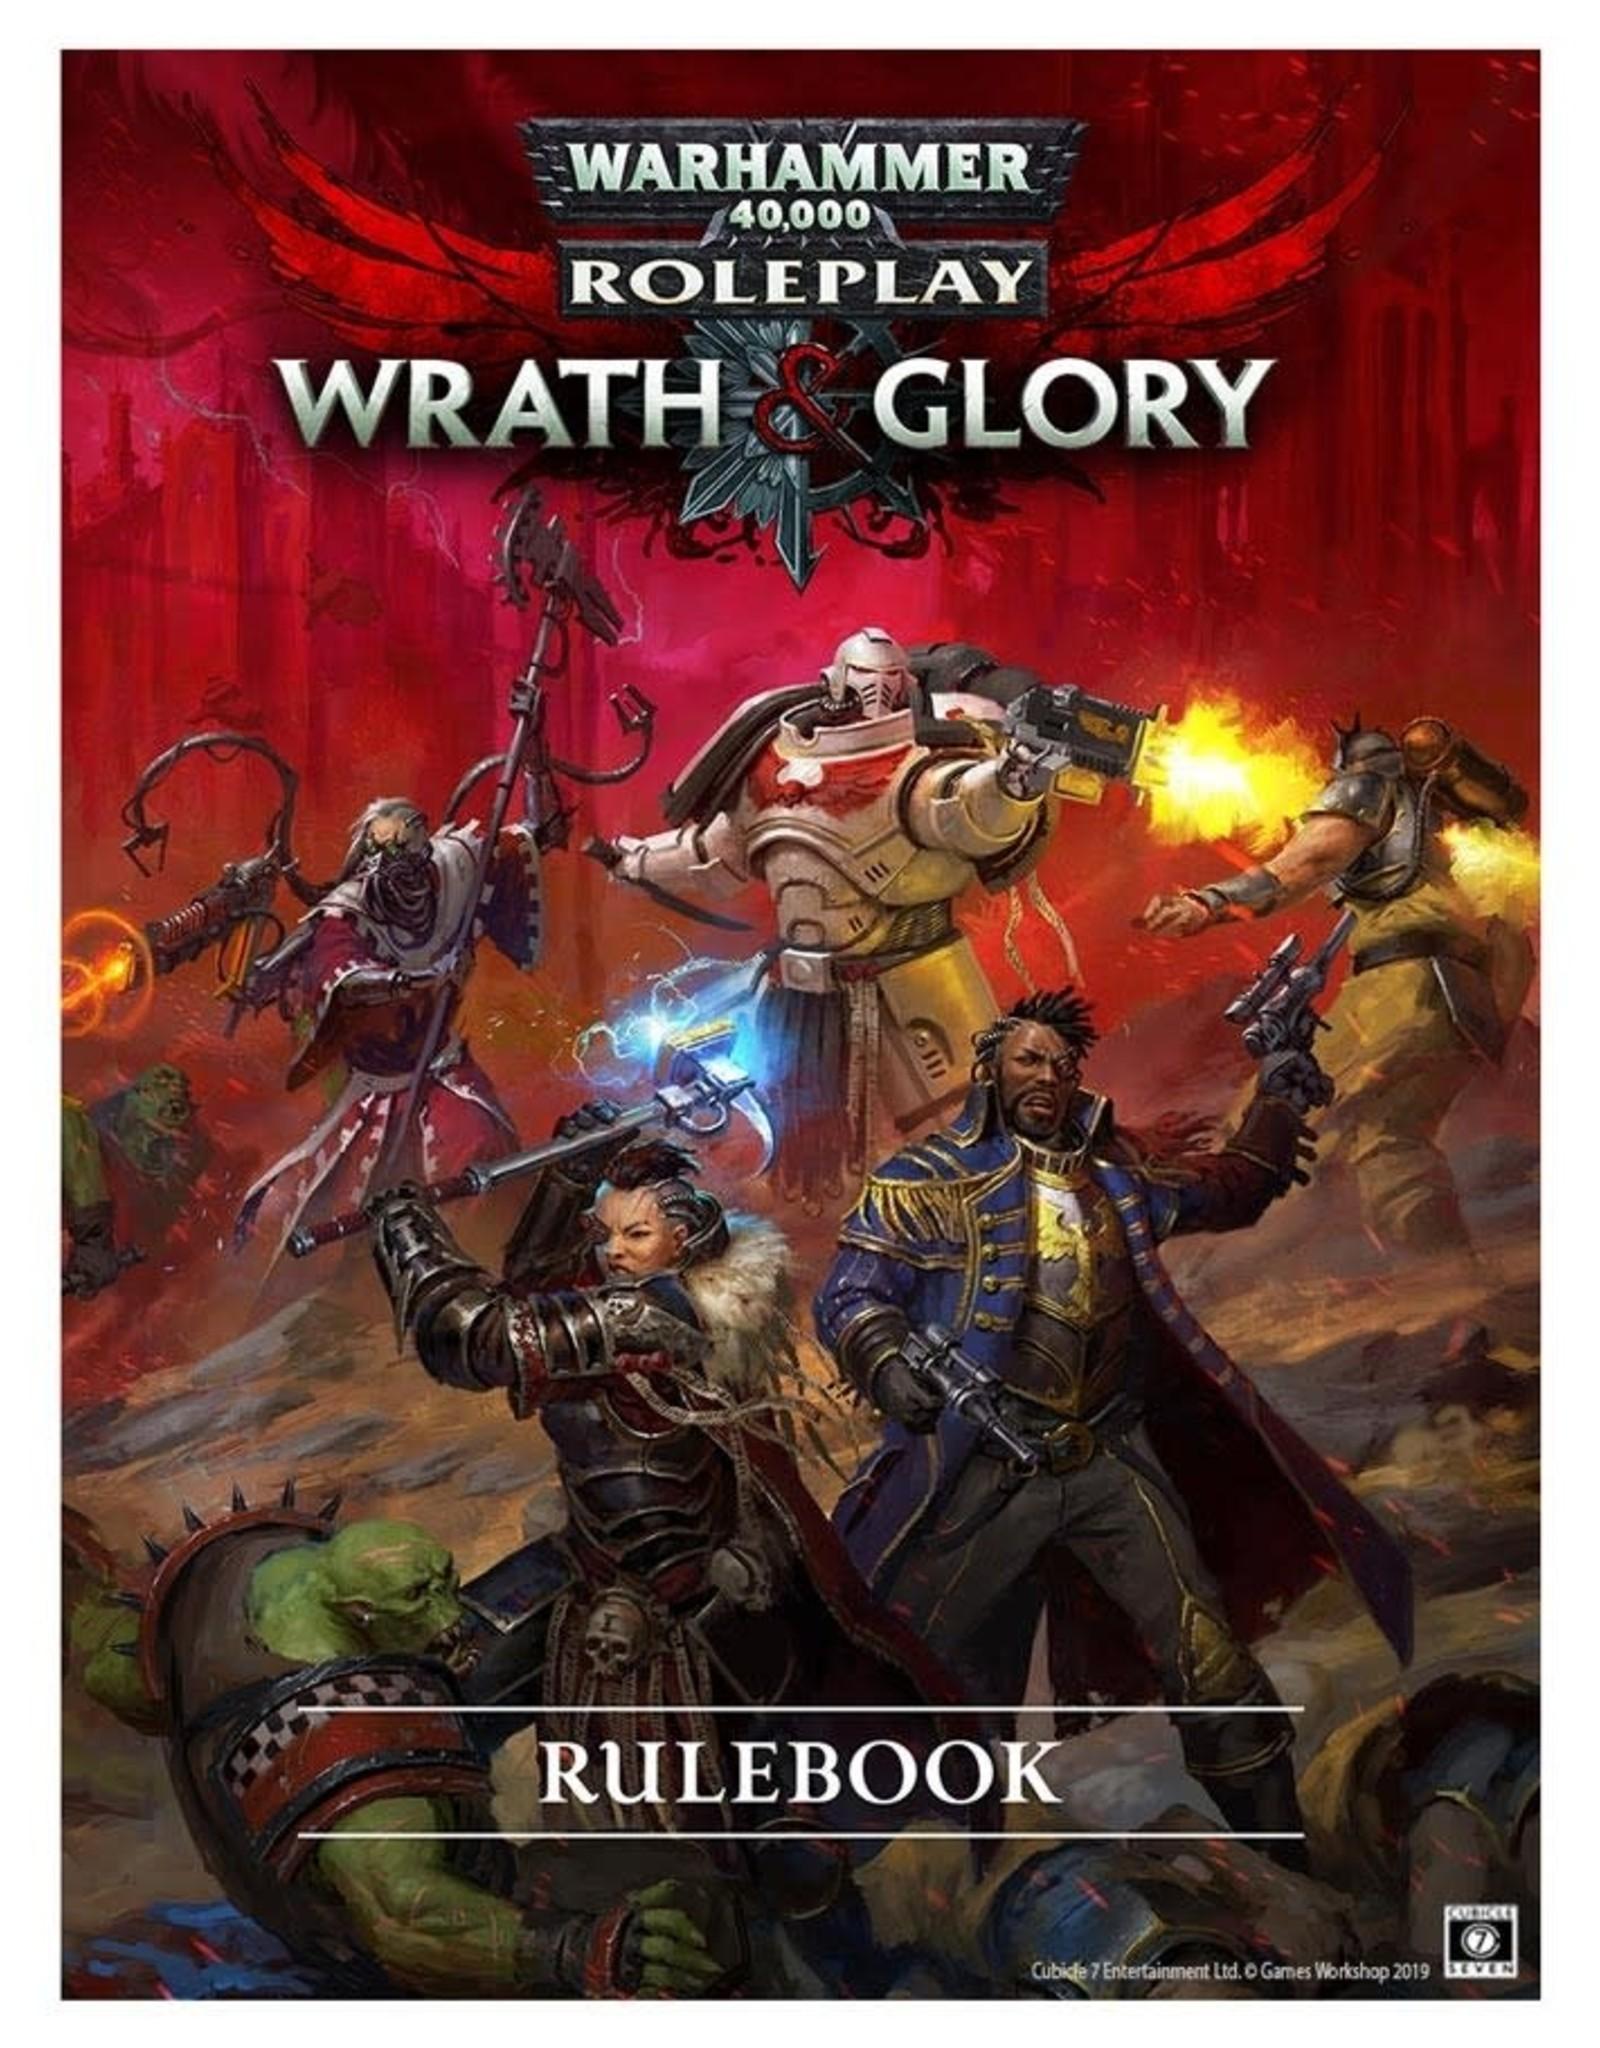 Crucible 7 Warhammer 40K Wrath & Glory RPG: Core Rulebook Revised (Pre-Order)